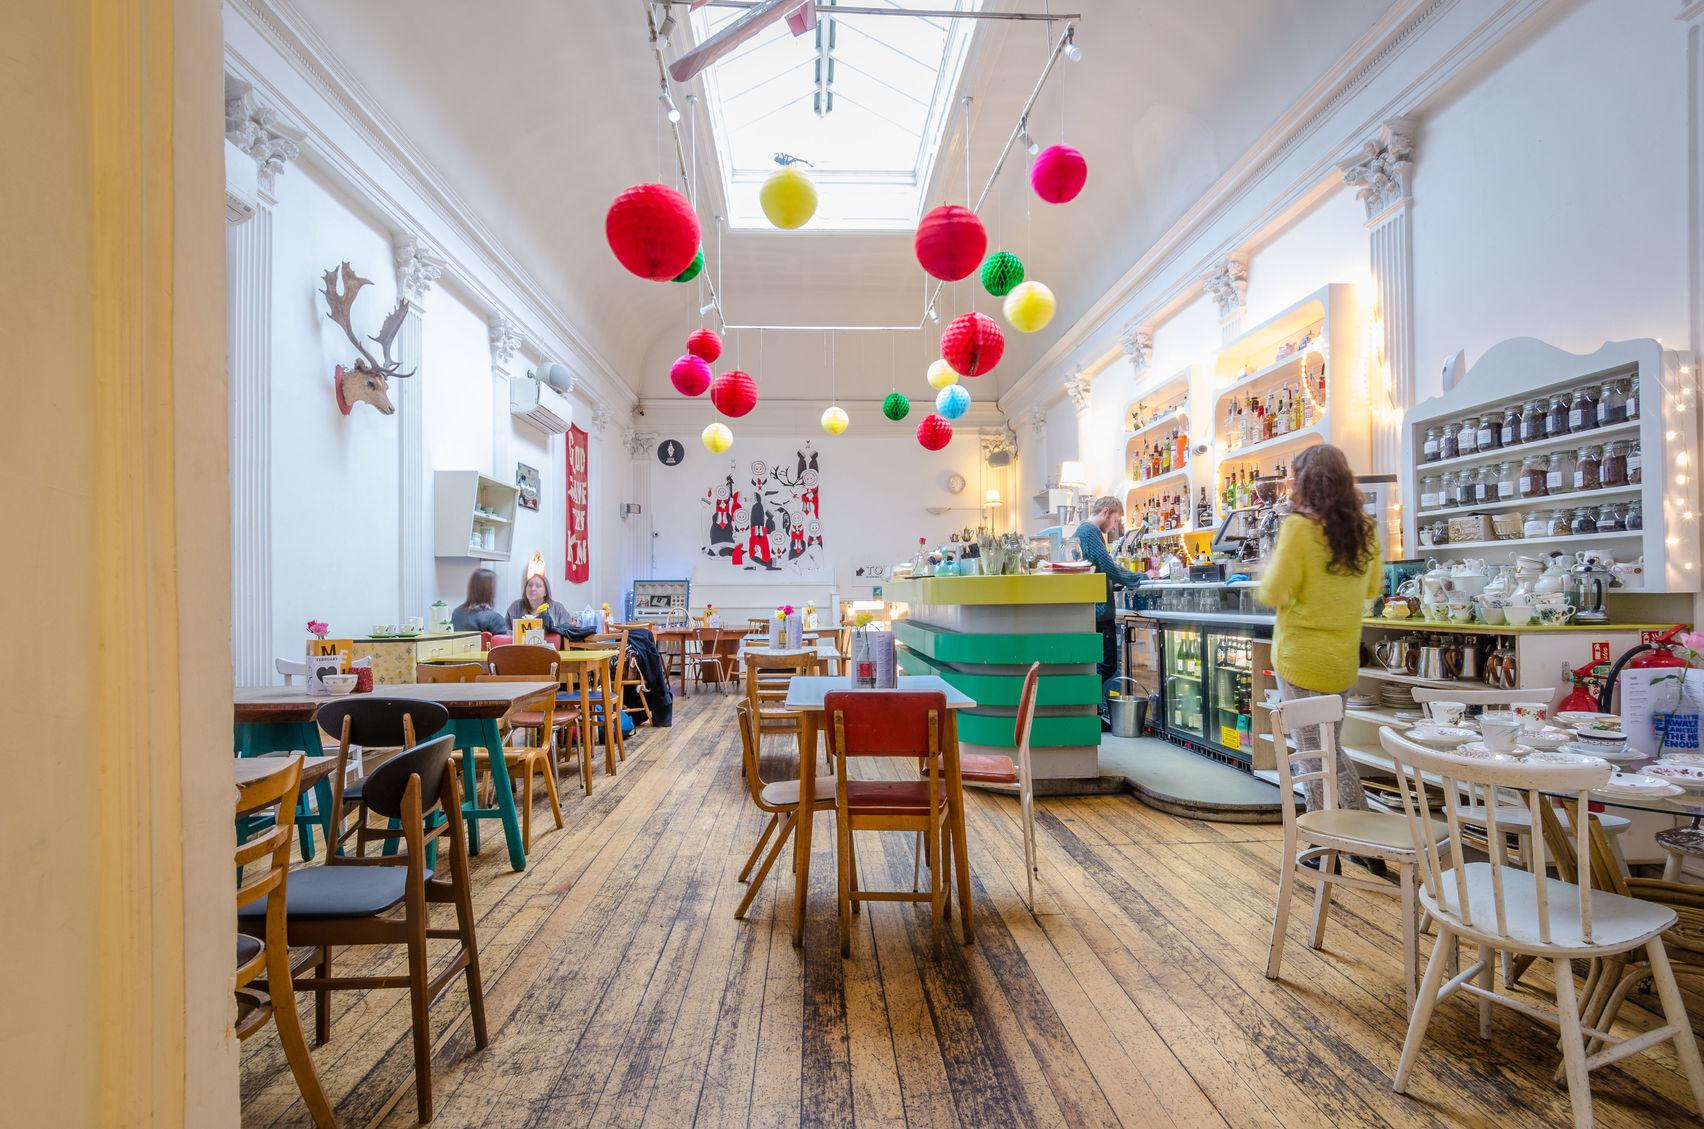 The Bar , Drink, Shop & Do